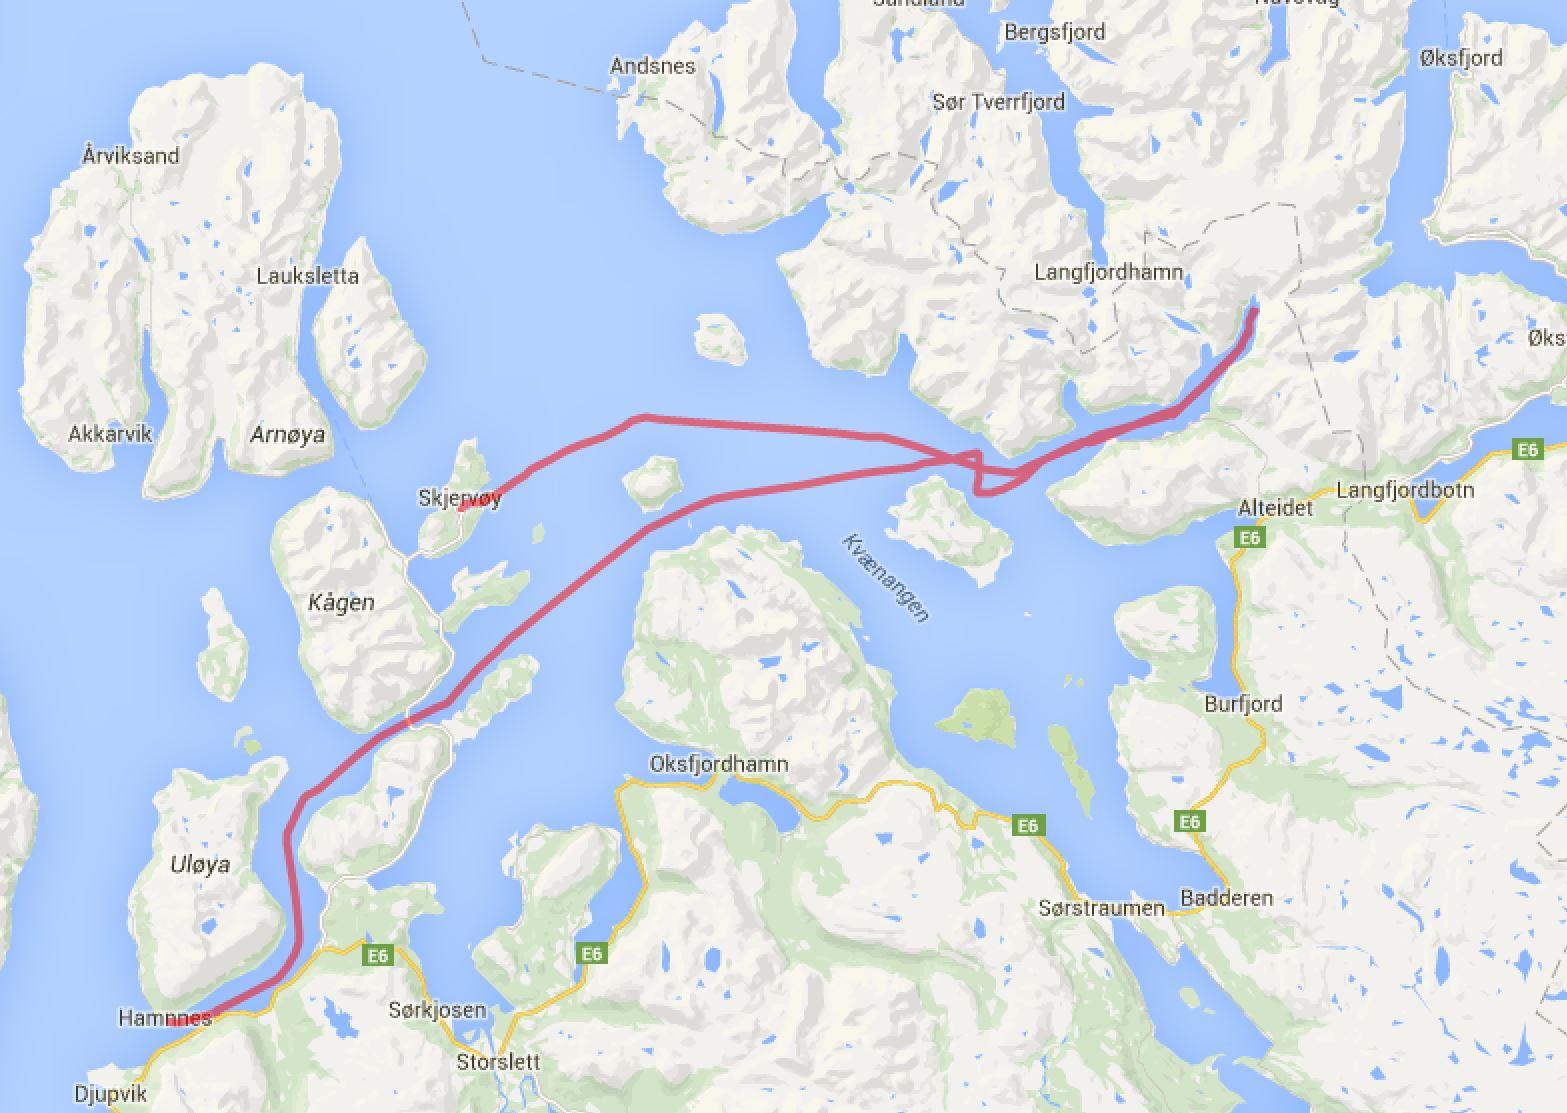 Skjervoy - Joekelfjord - Havnnes